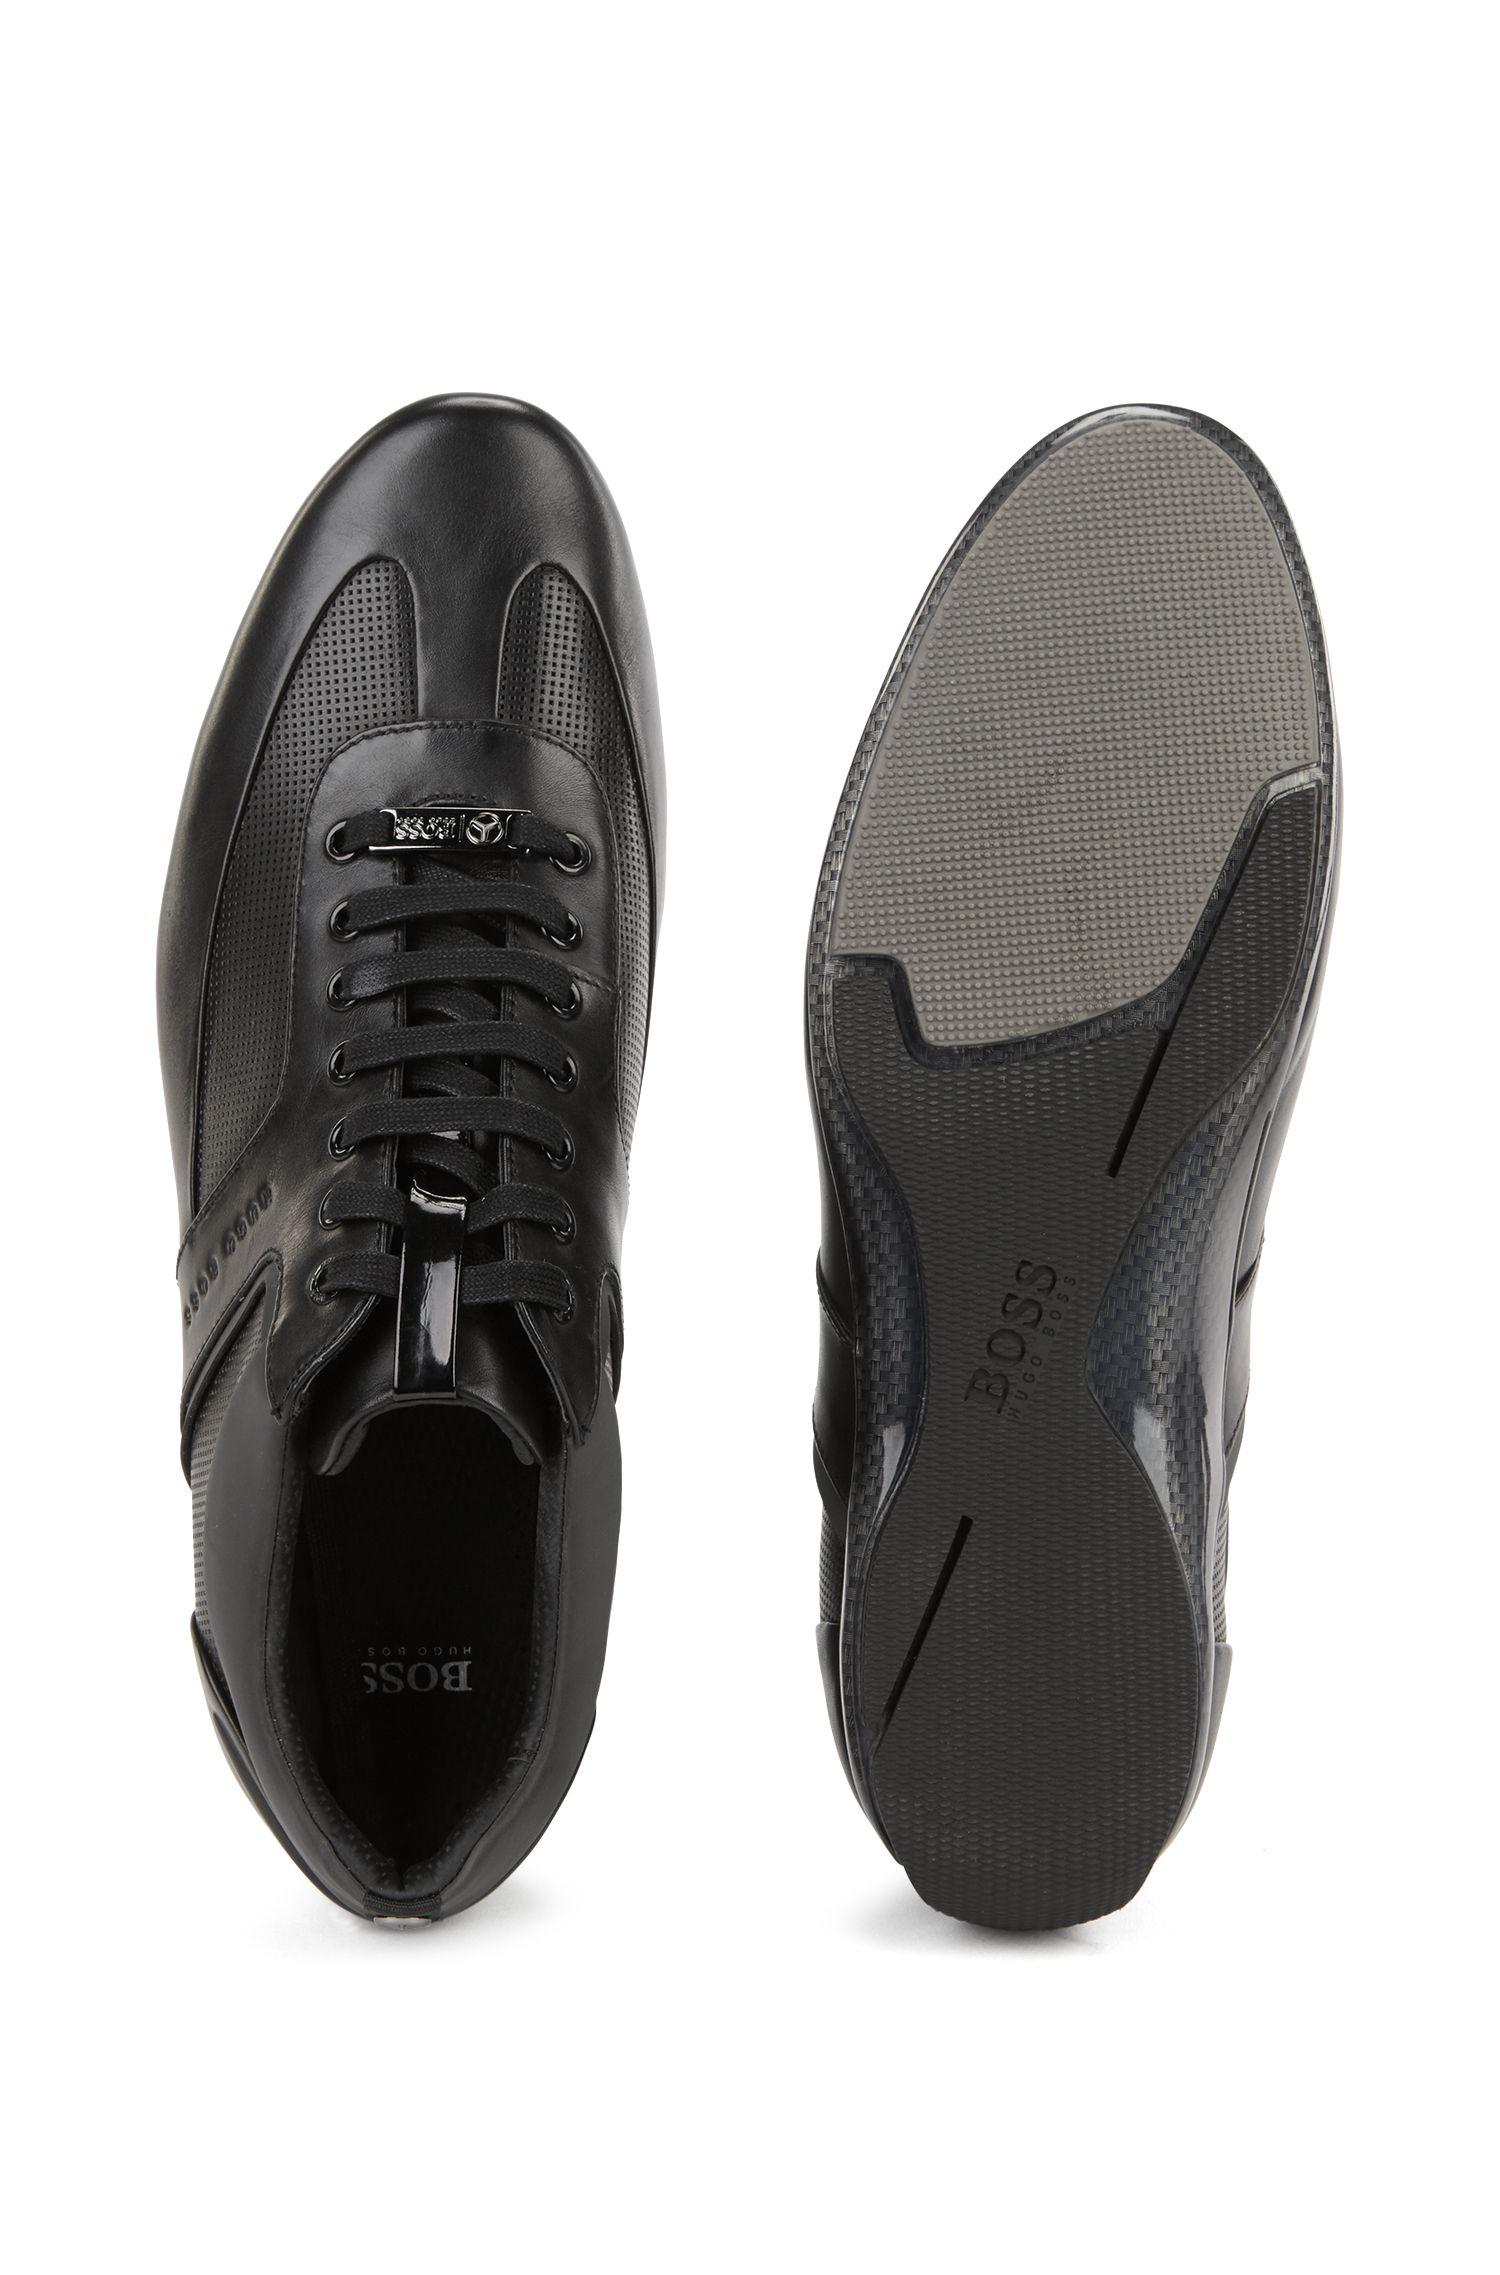 Sneakers aus Leder mit Kontrast-Details aus der Mercedes-Benz Kollektion